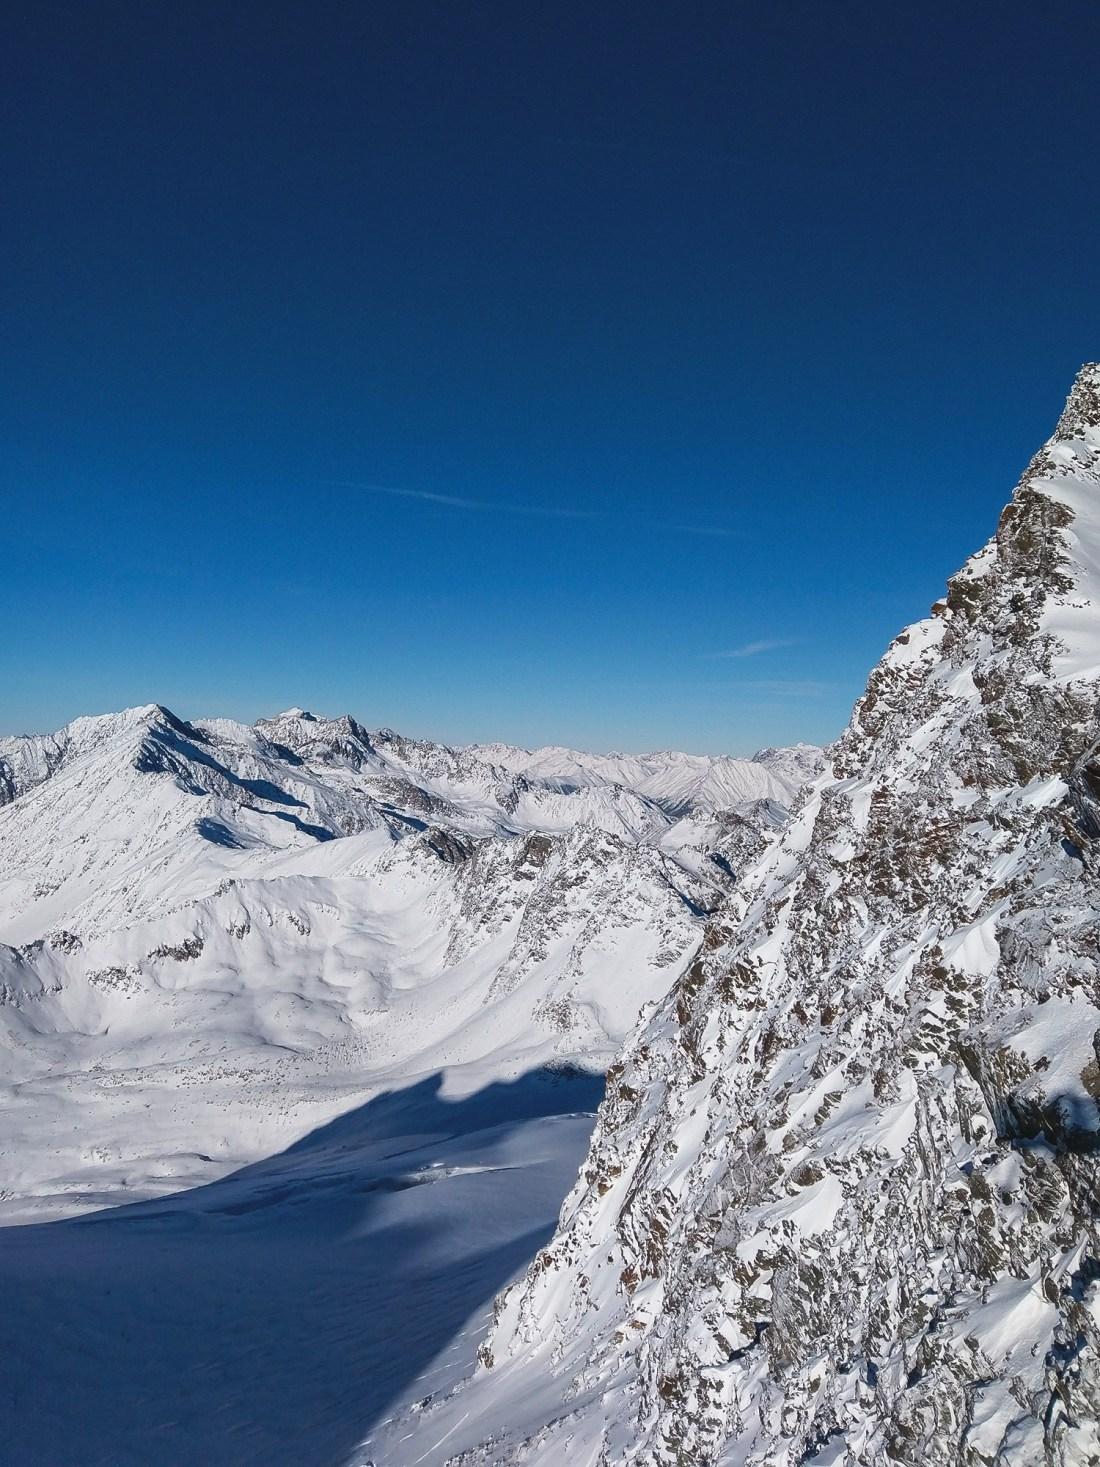 Solden Mountain Top Views - Skiing